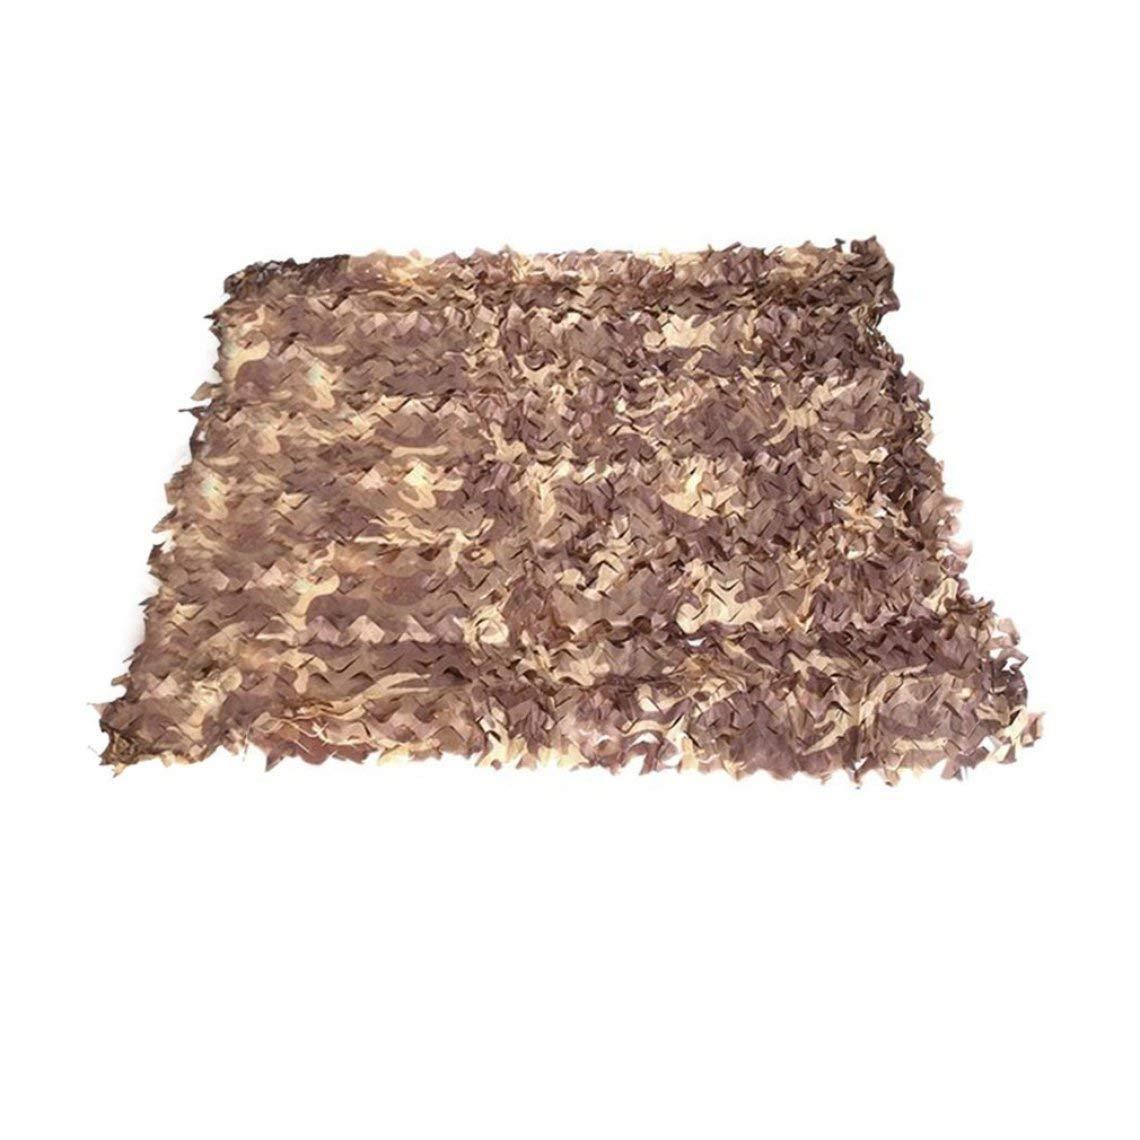 810m(26.232.8FT) CPSHWZW Filet de Camouflage pour Plantes de Jardin en Polyester Oxford Desert pour Camping, Camping, Chasse Militaire, Chasse, Store pour Regarder Les Stores, Polyester, 4  5M(13.1  16.4ft)